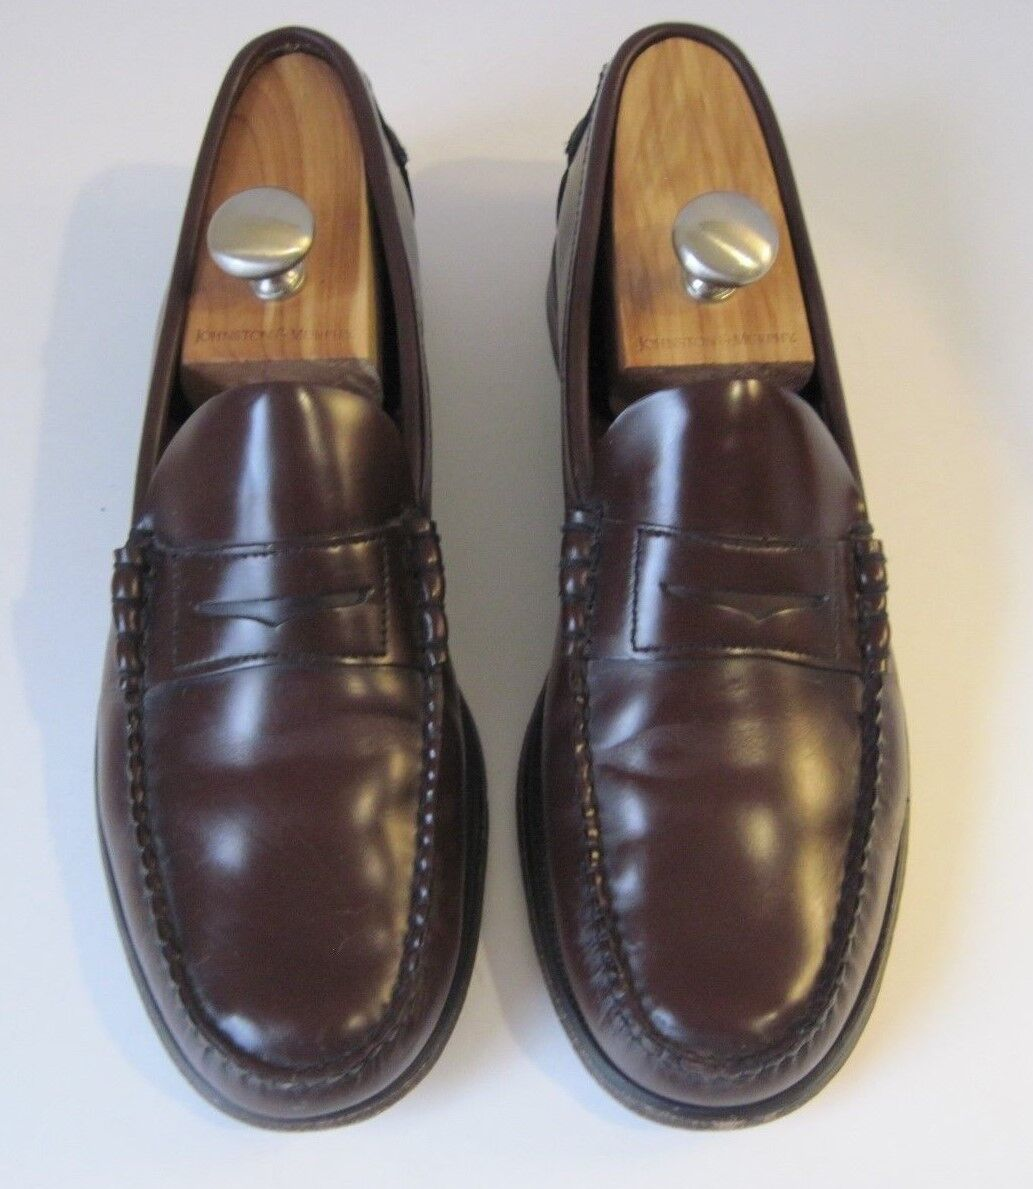 SEBAGO SEBAGO SEBAGO Burgundy Pelle Handsewn Penny Loafer Shoes Uomo Size 13D e43ac6